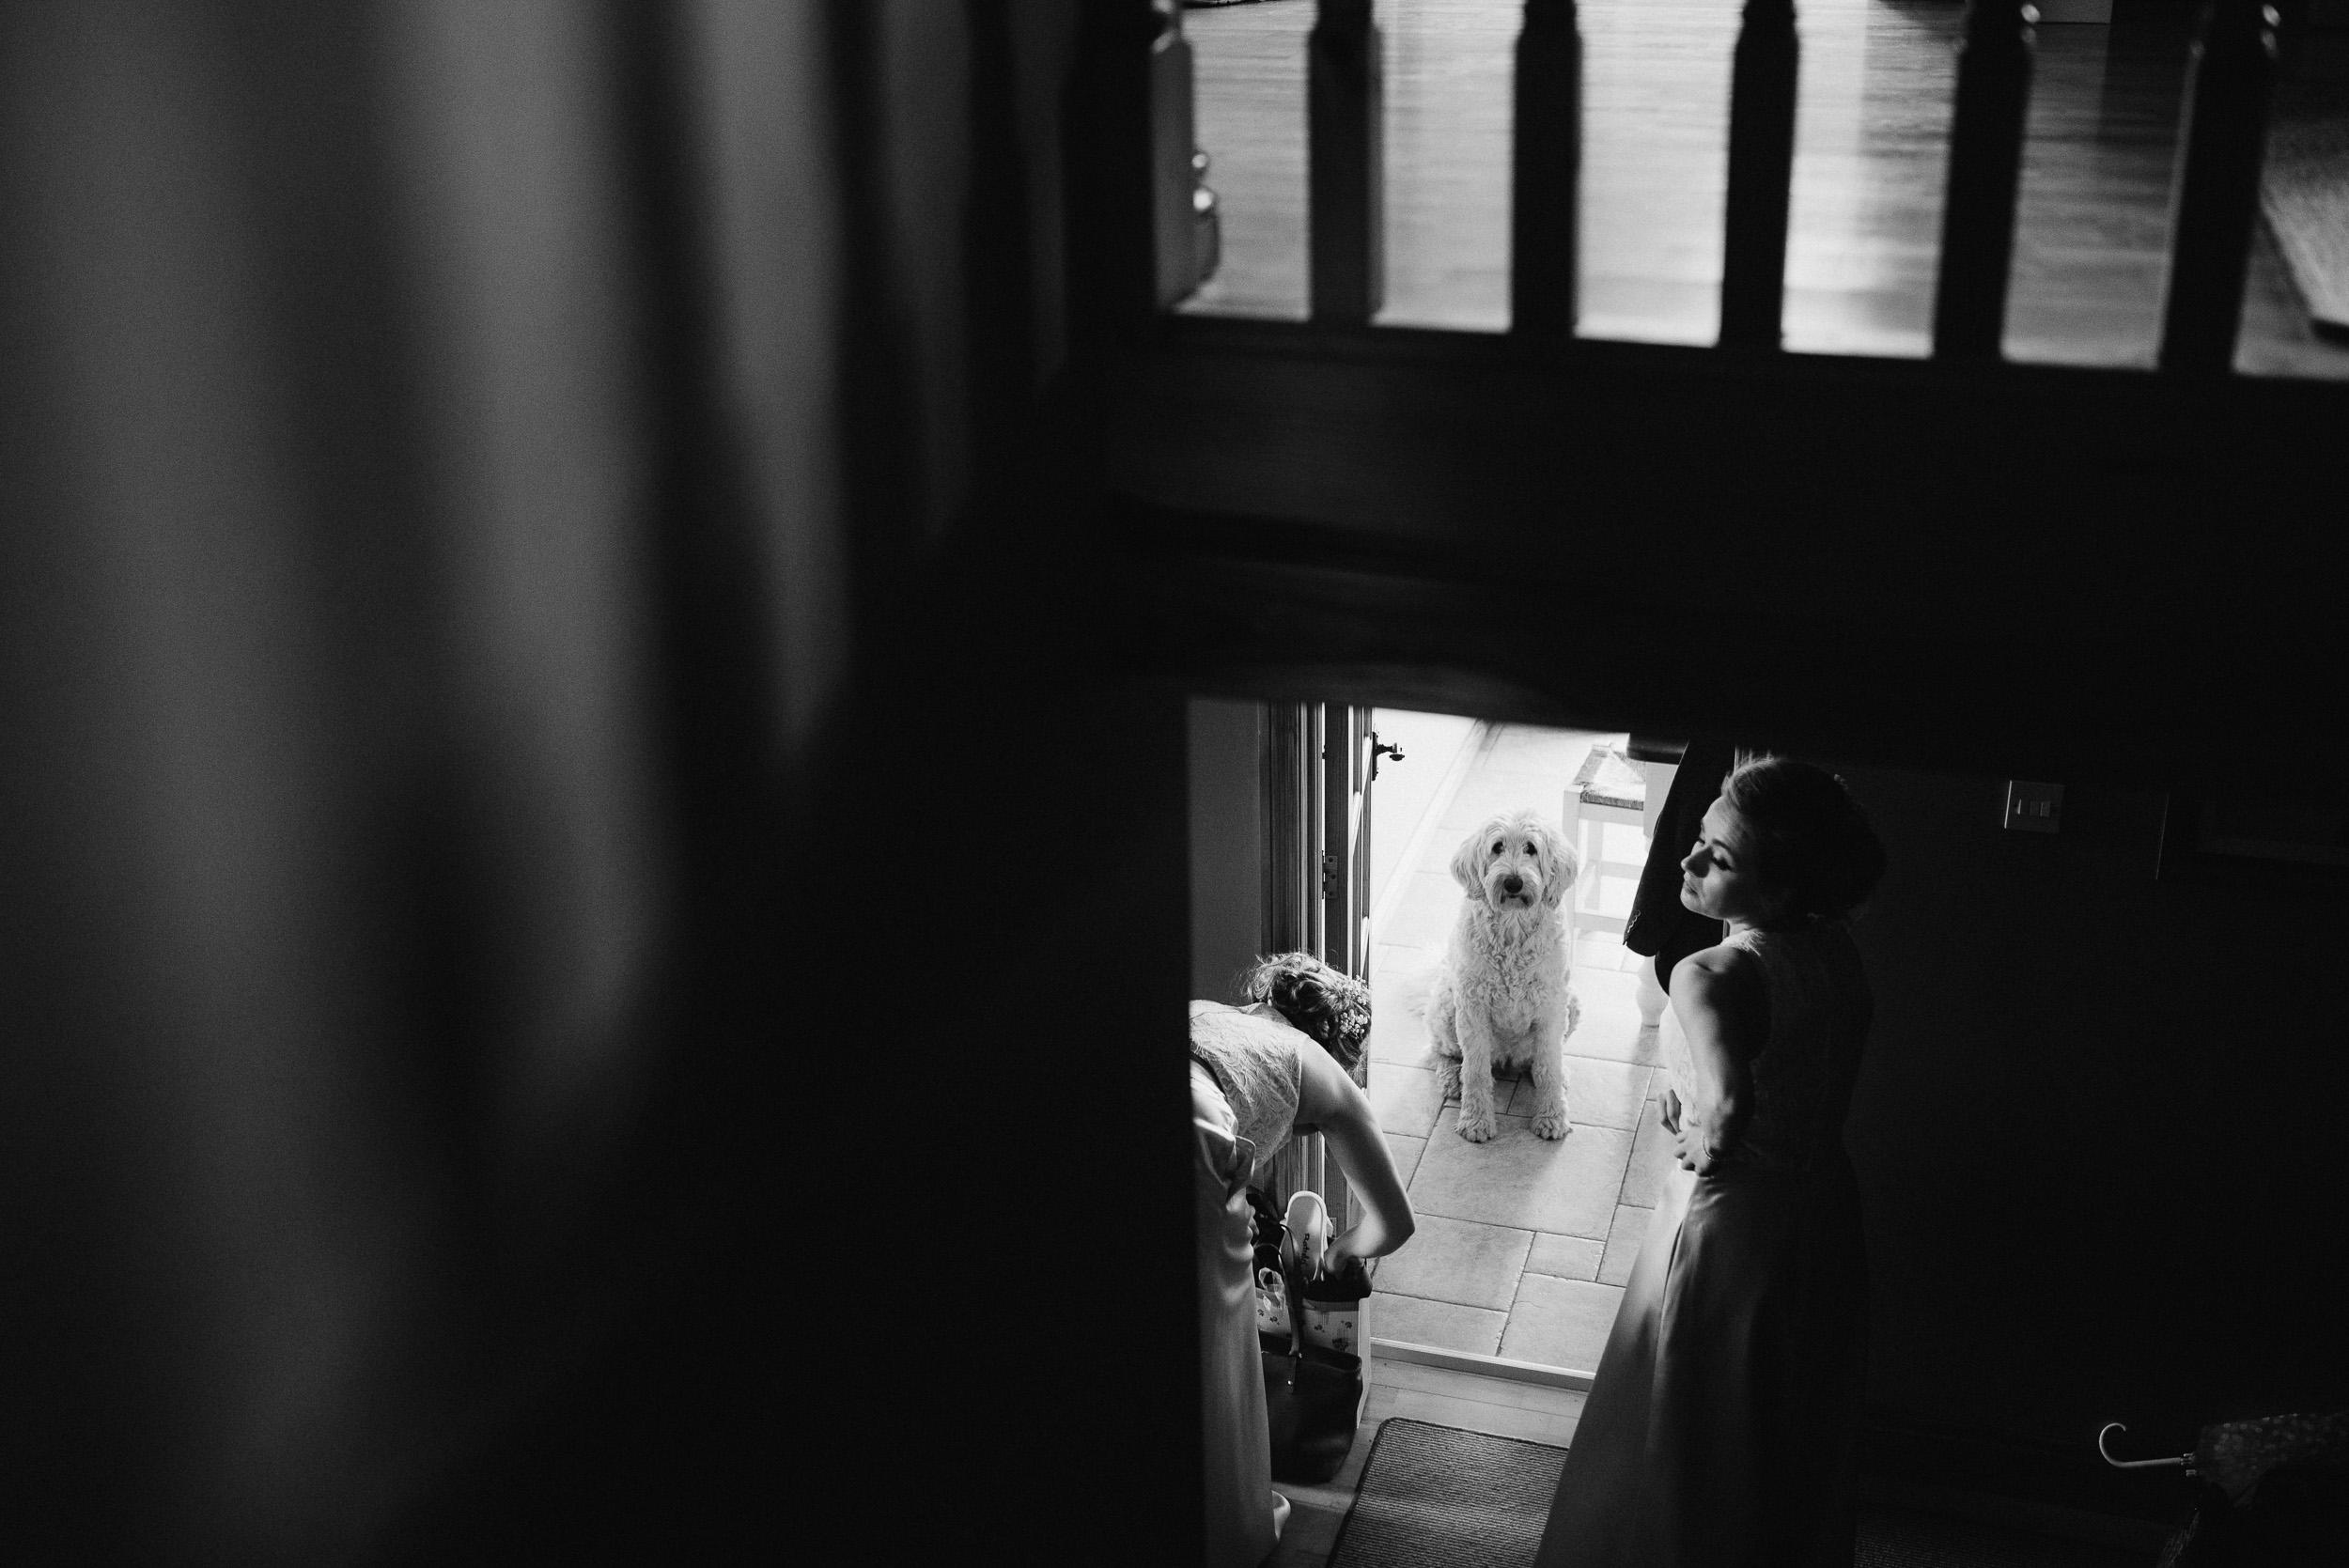 wedding photogaphy peter mackey 2018 jordam-2.jpg